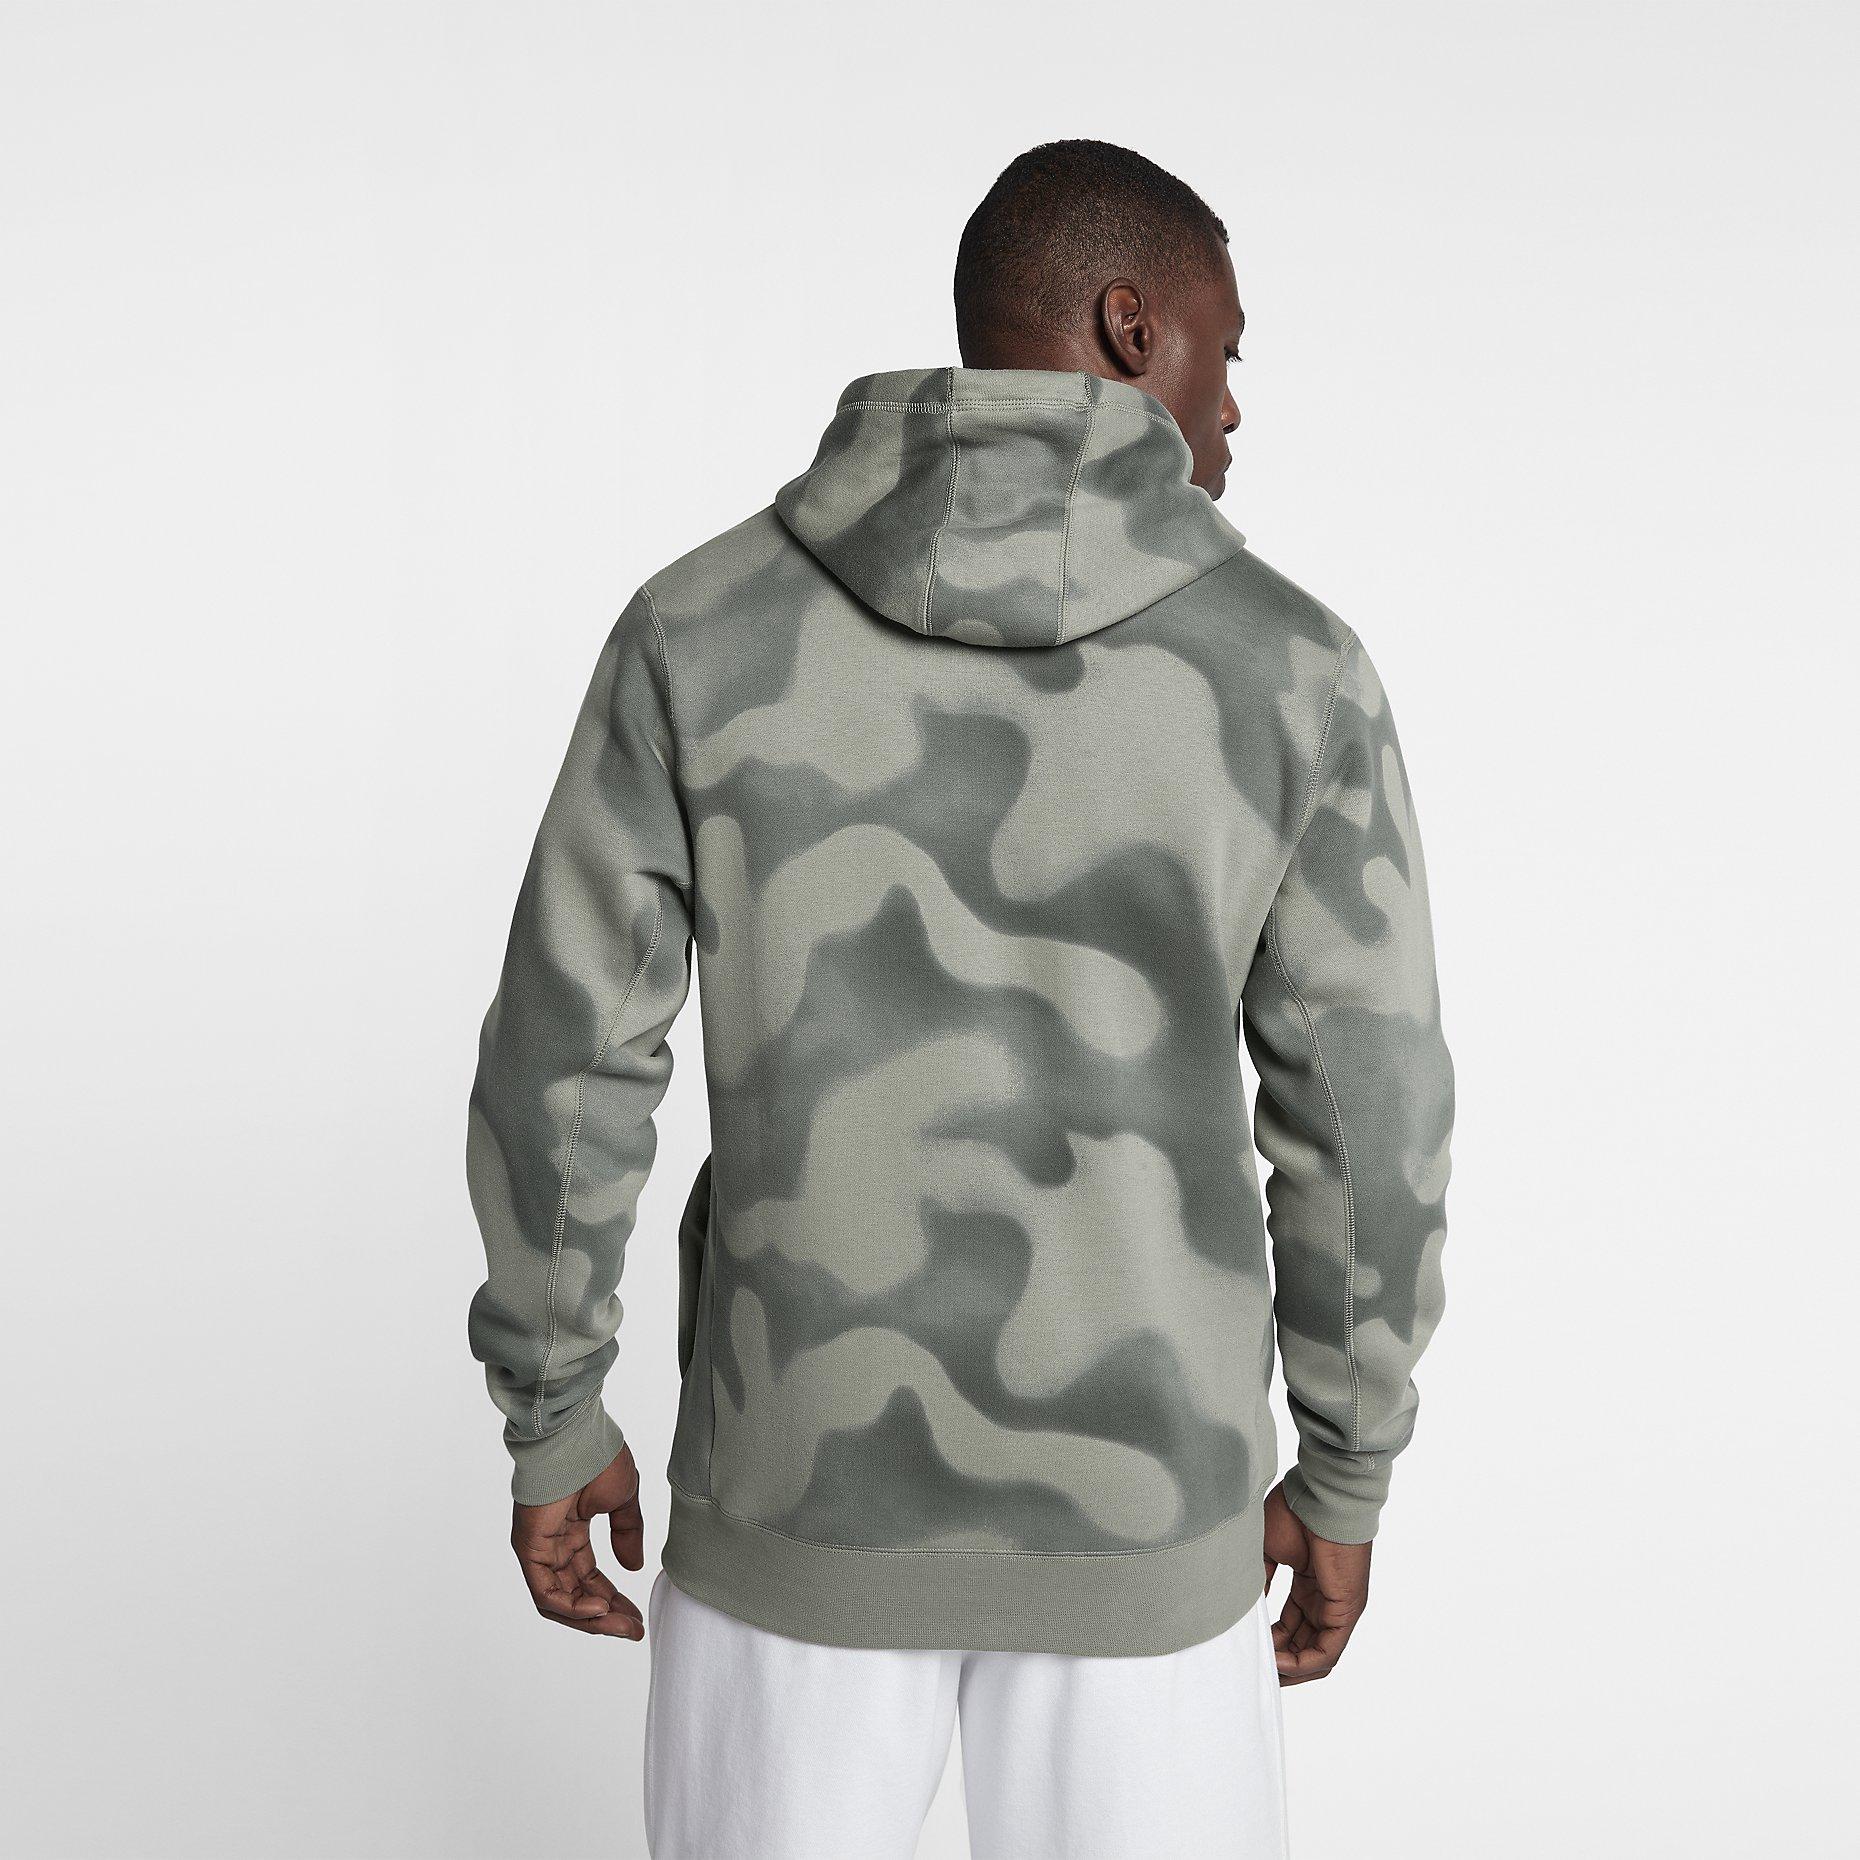 jordan-sportswear-p51-flight-mens-fleece-pullover-hoodie (1).jpg